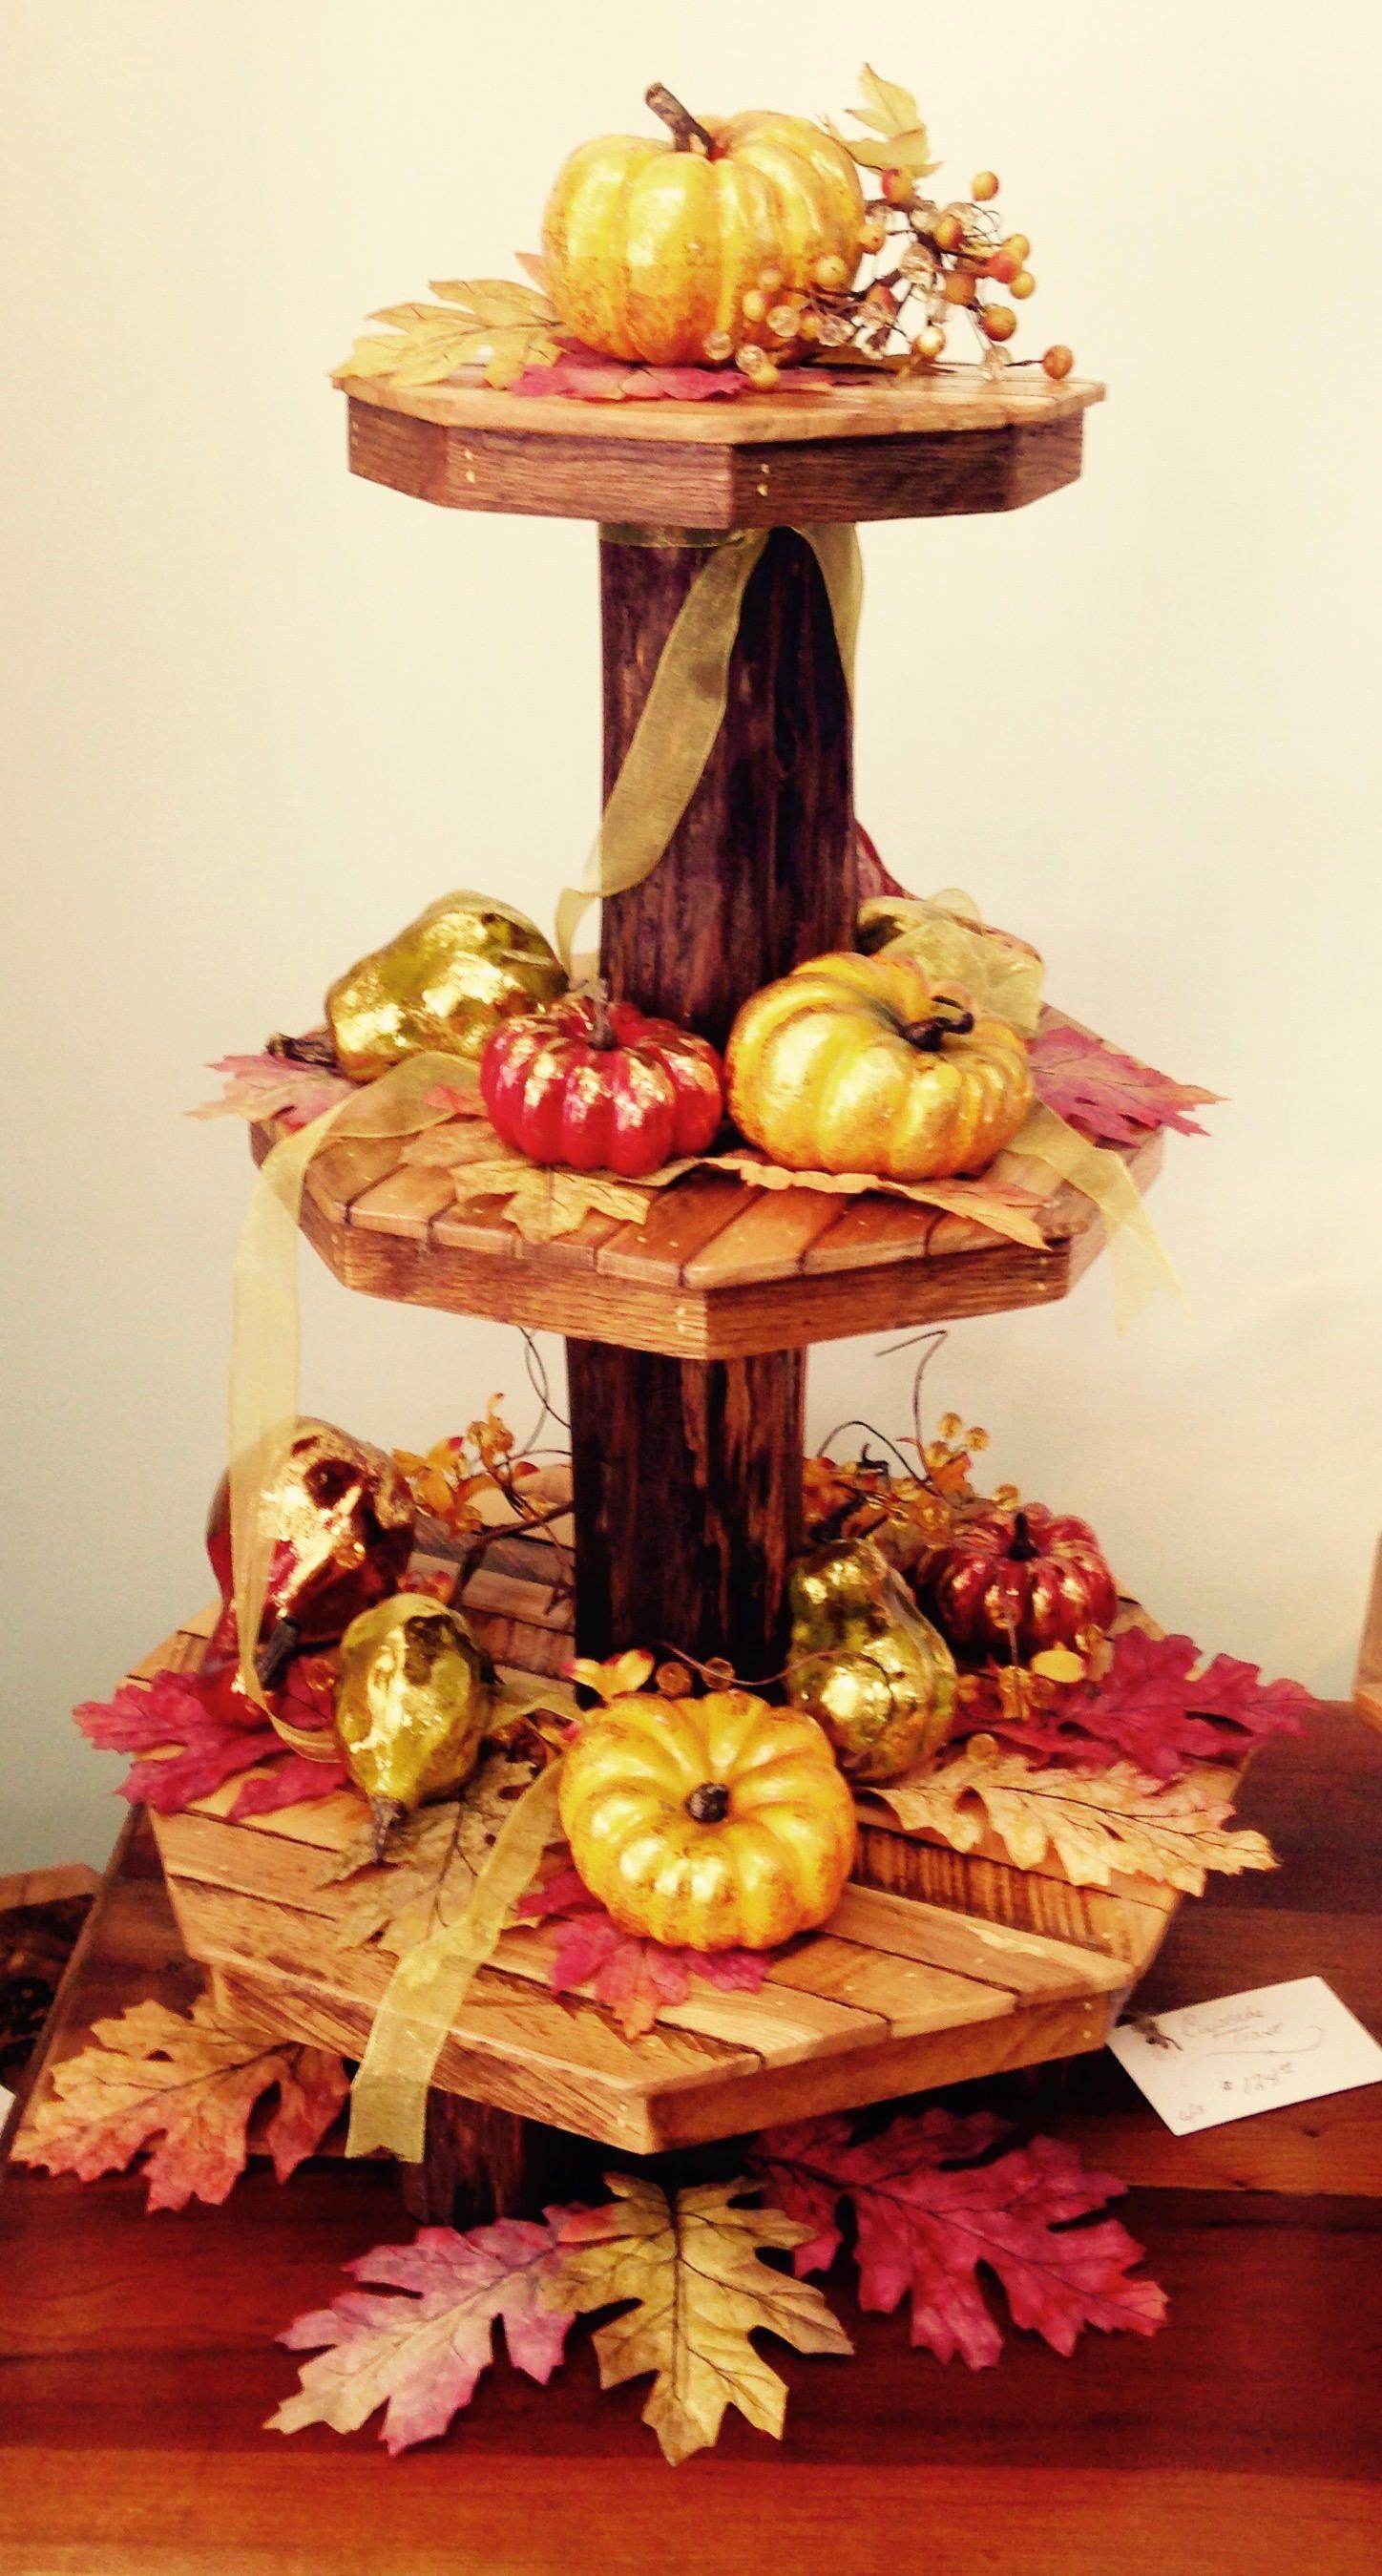 Centerpiece pedestal cupcake stand display solid wood